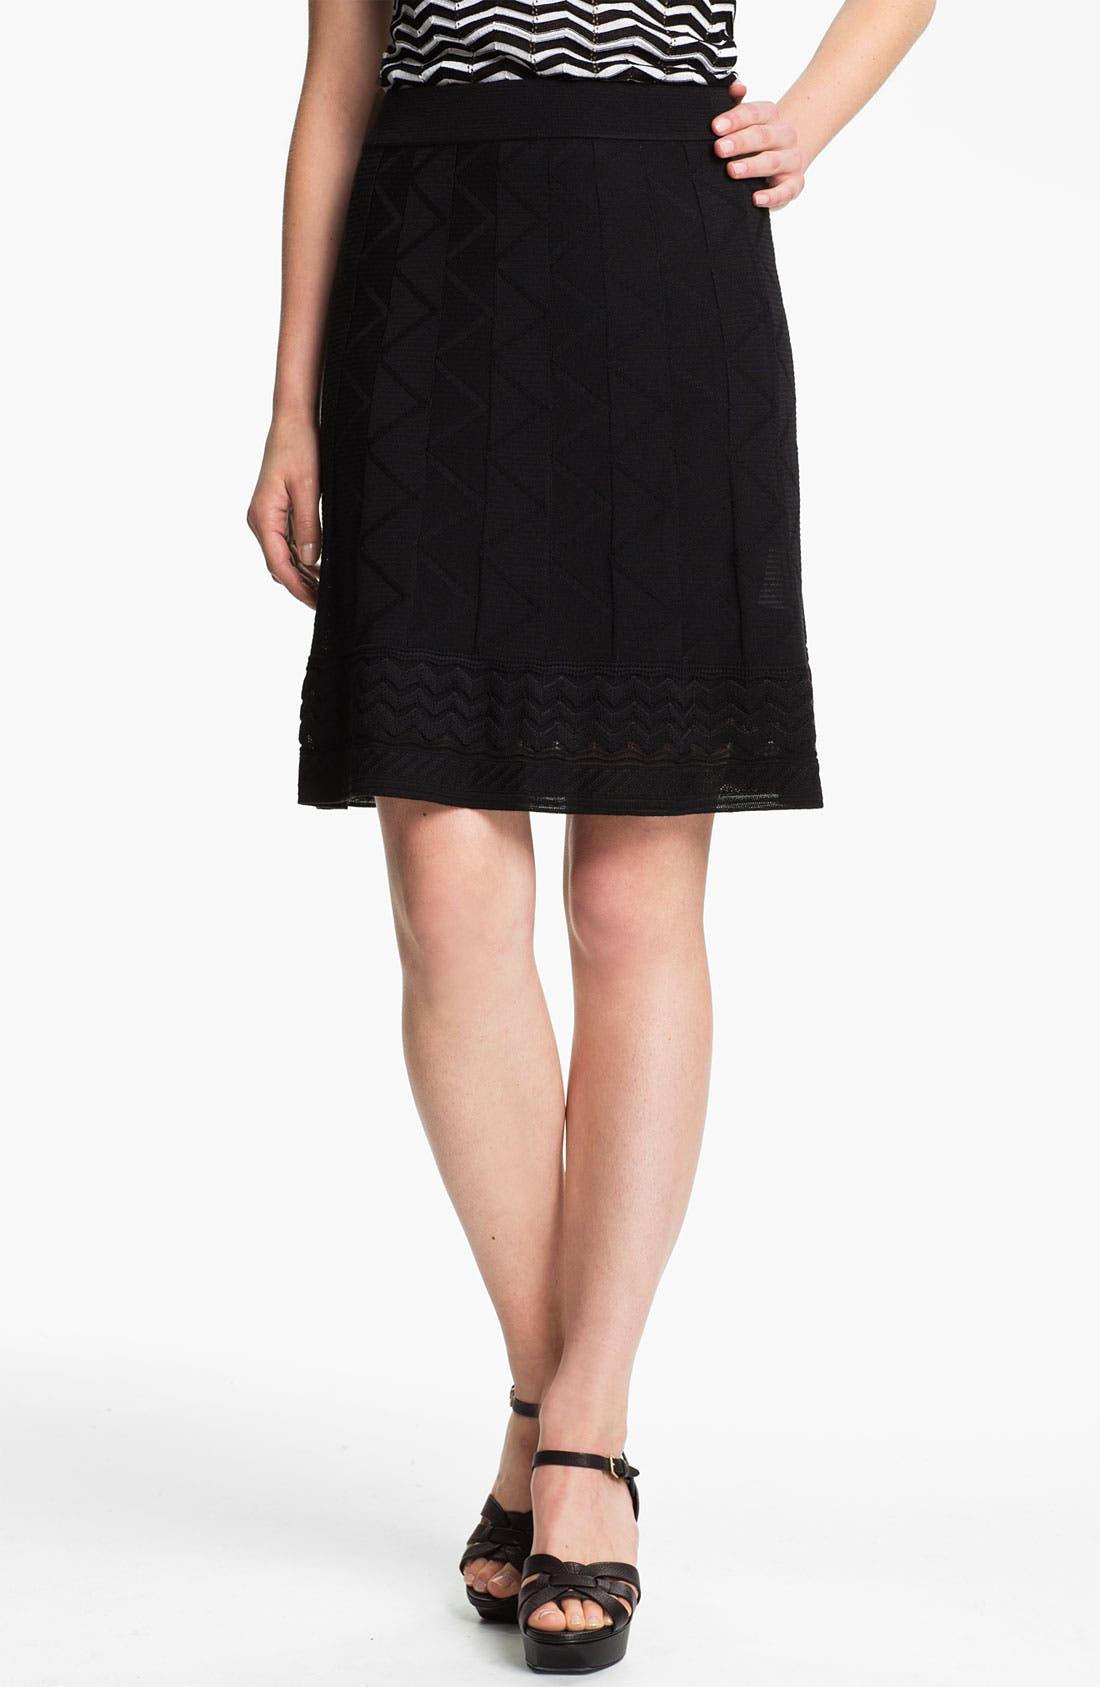 Alternate Image 1 Selected - M Missoni Tonal Zigzag Skirt